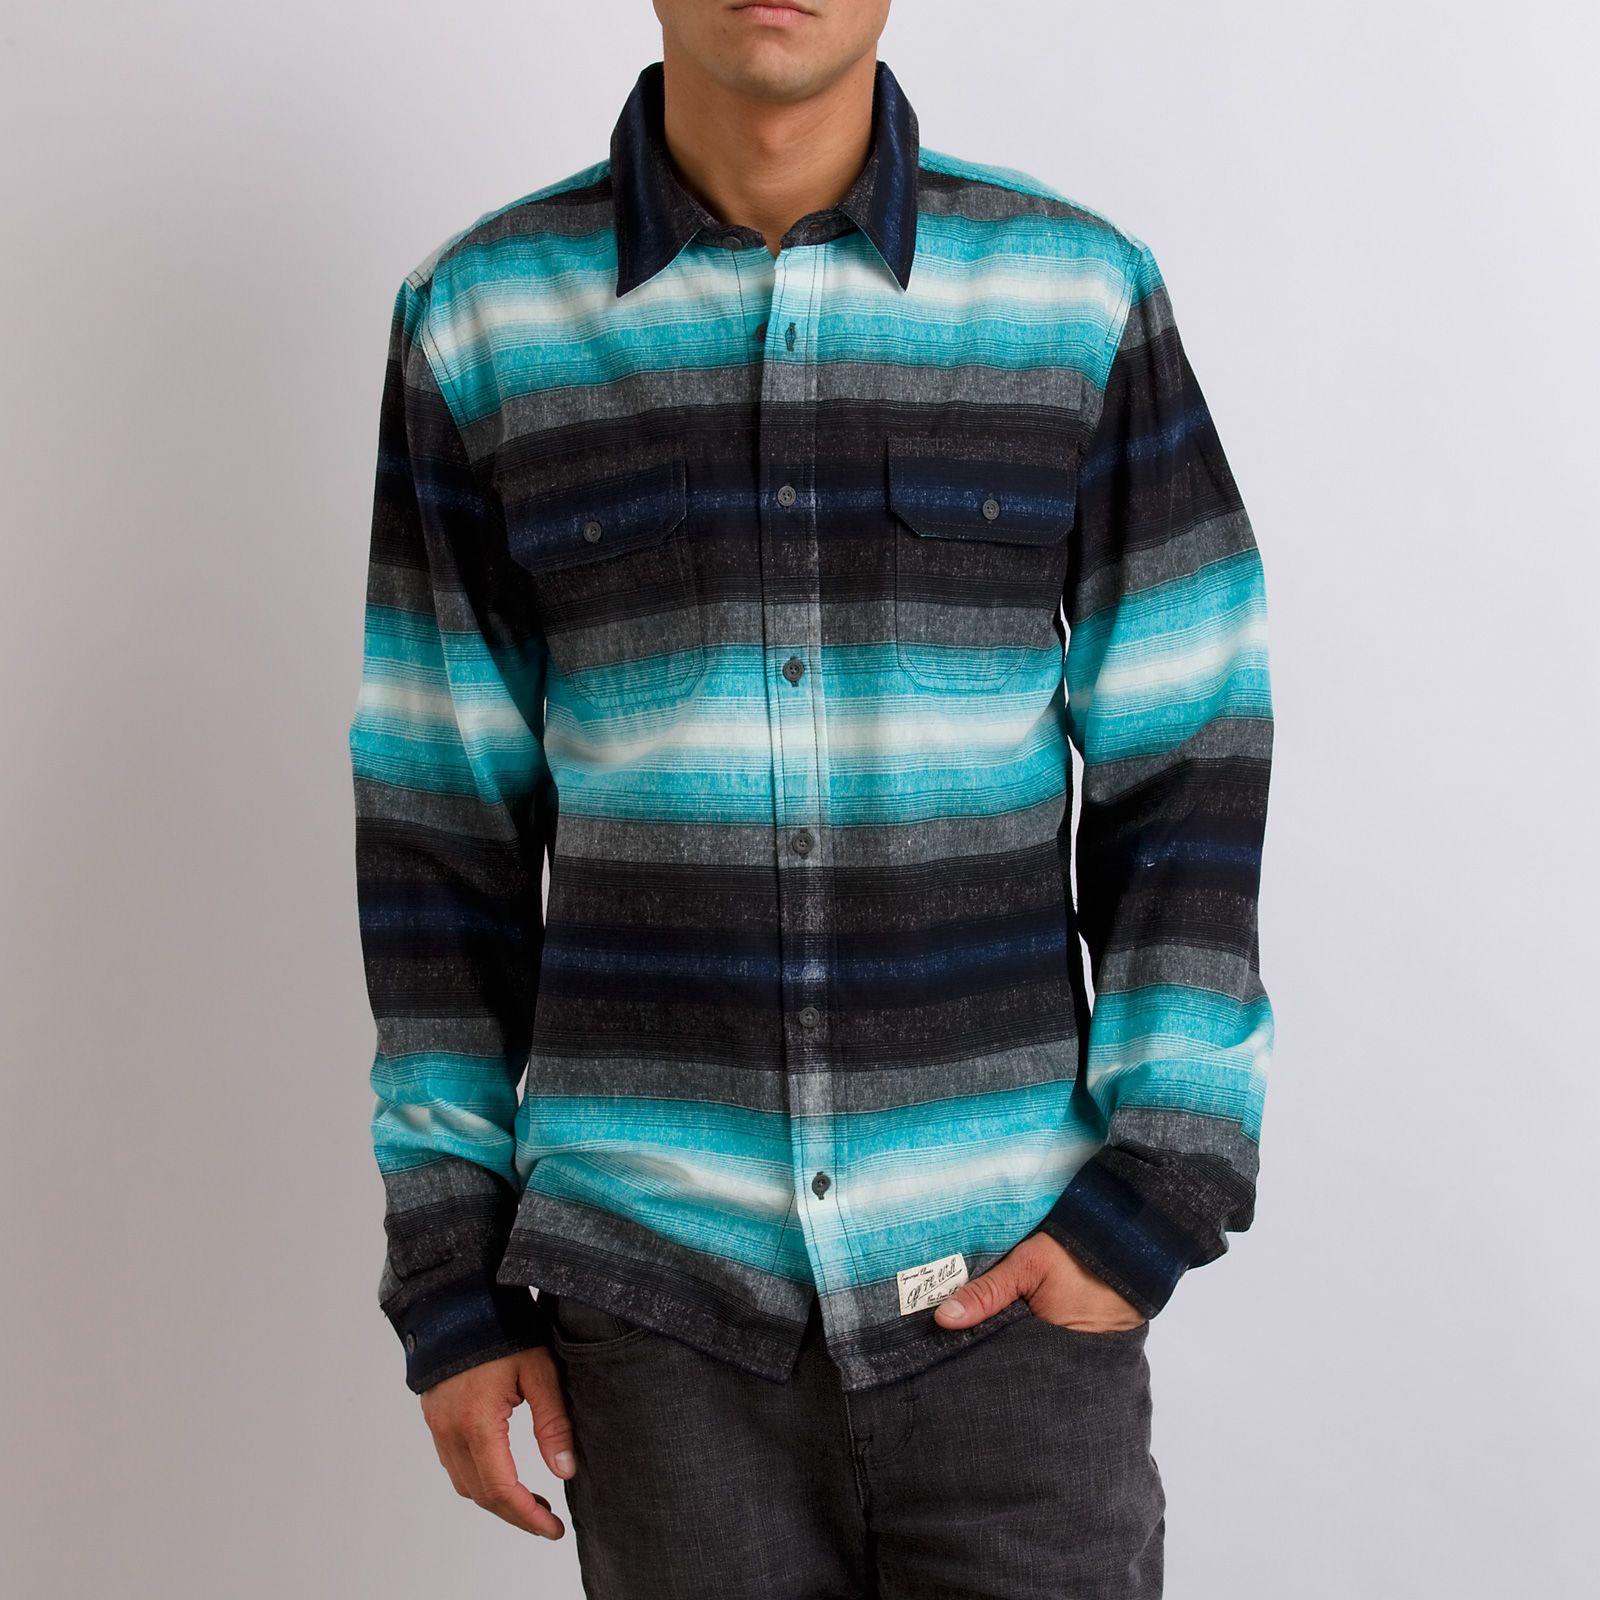 Flannel shirt and shorts men  VANS HOMBRE STRIPE SHIRT  Apparel Cut and Sew Menus  Pinterest